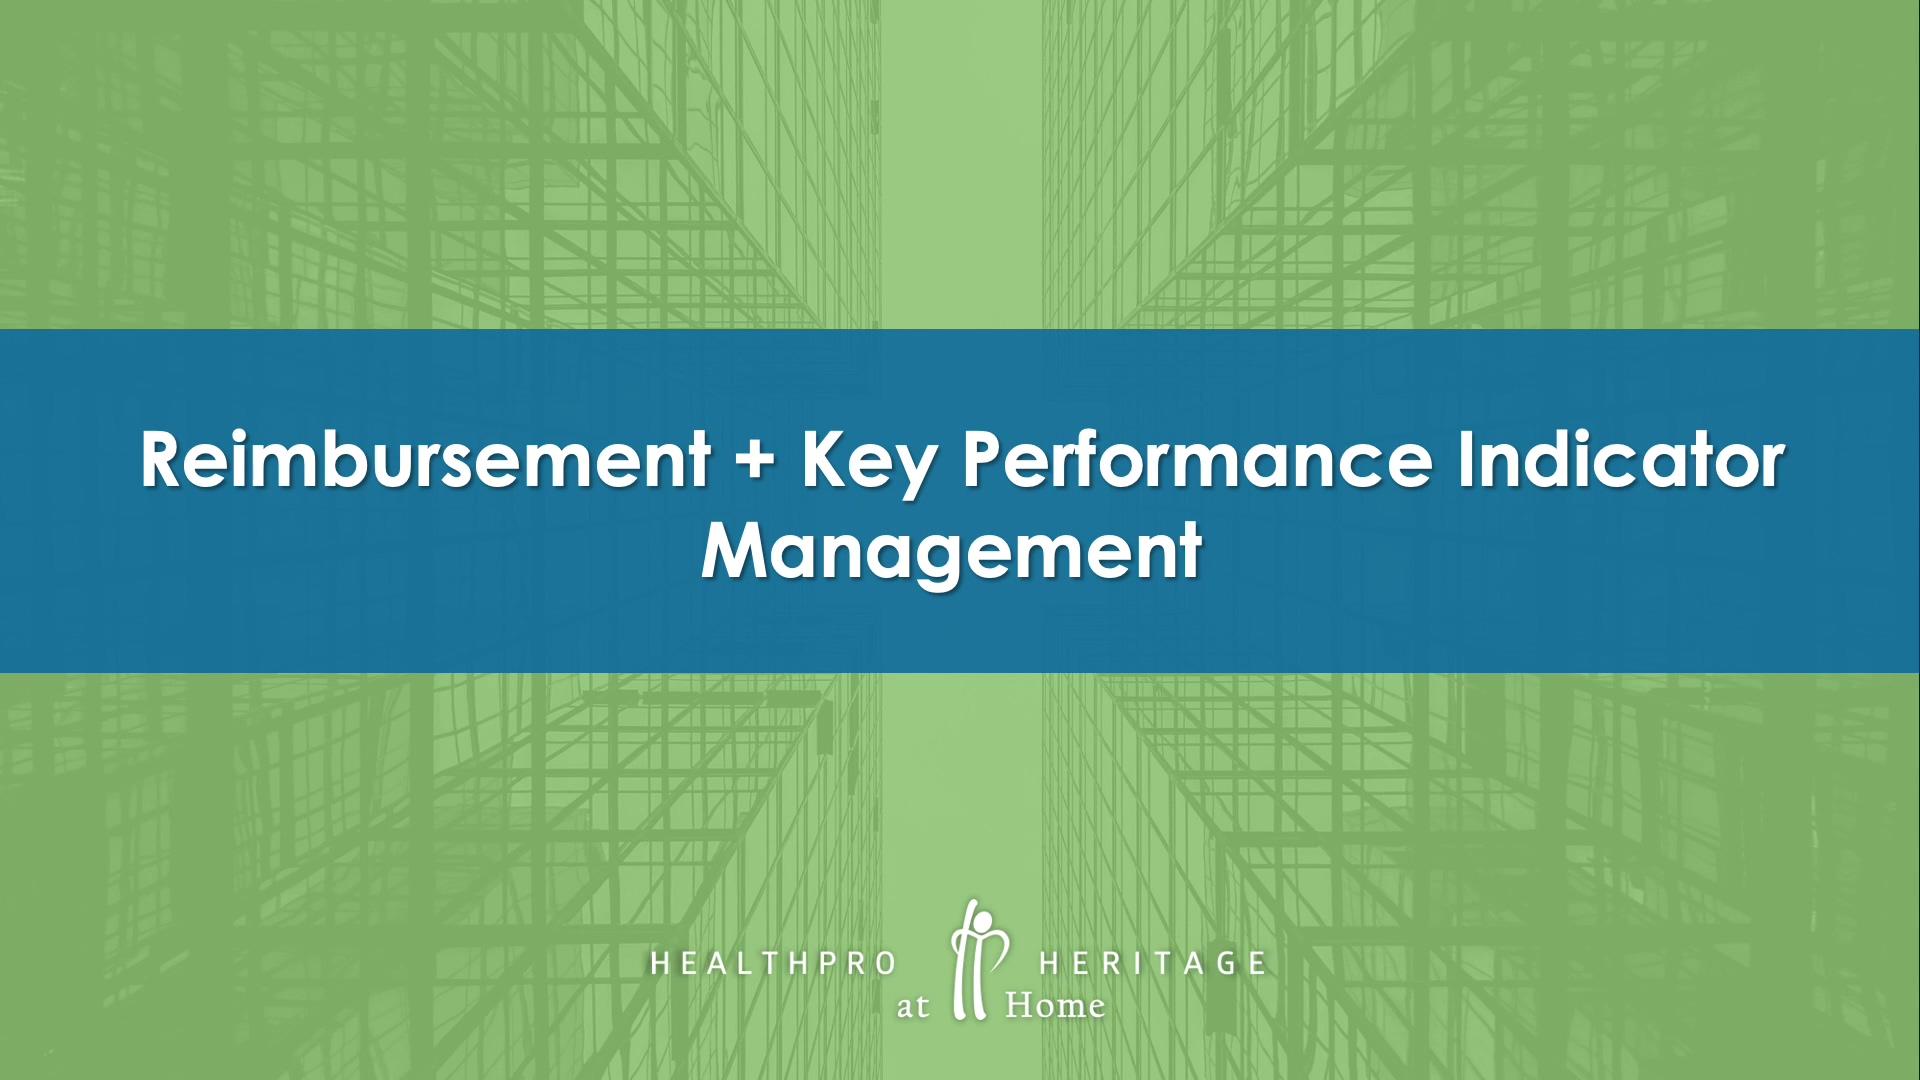 HealthPRO Heritage at Home - Reimbursement + KPI Management